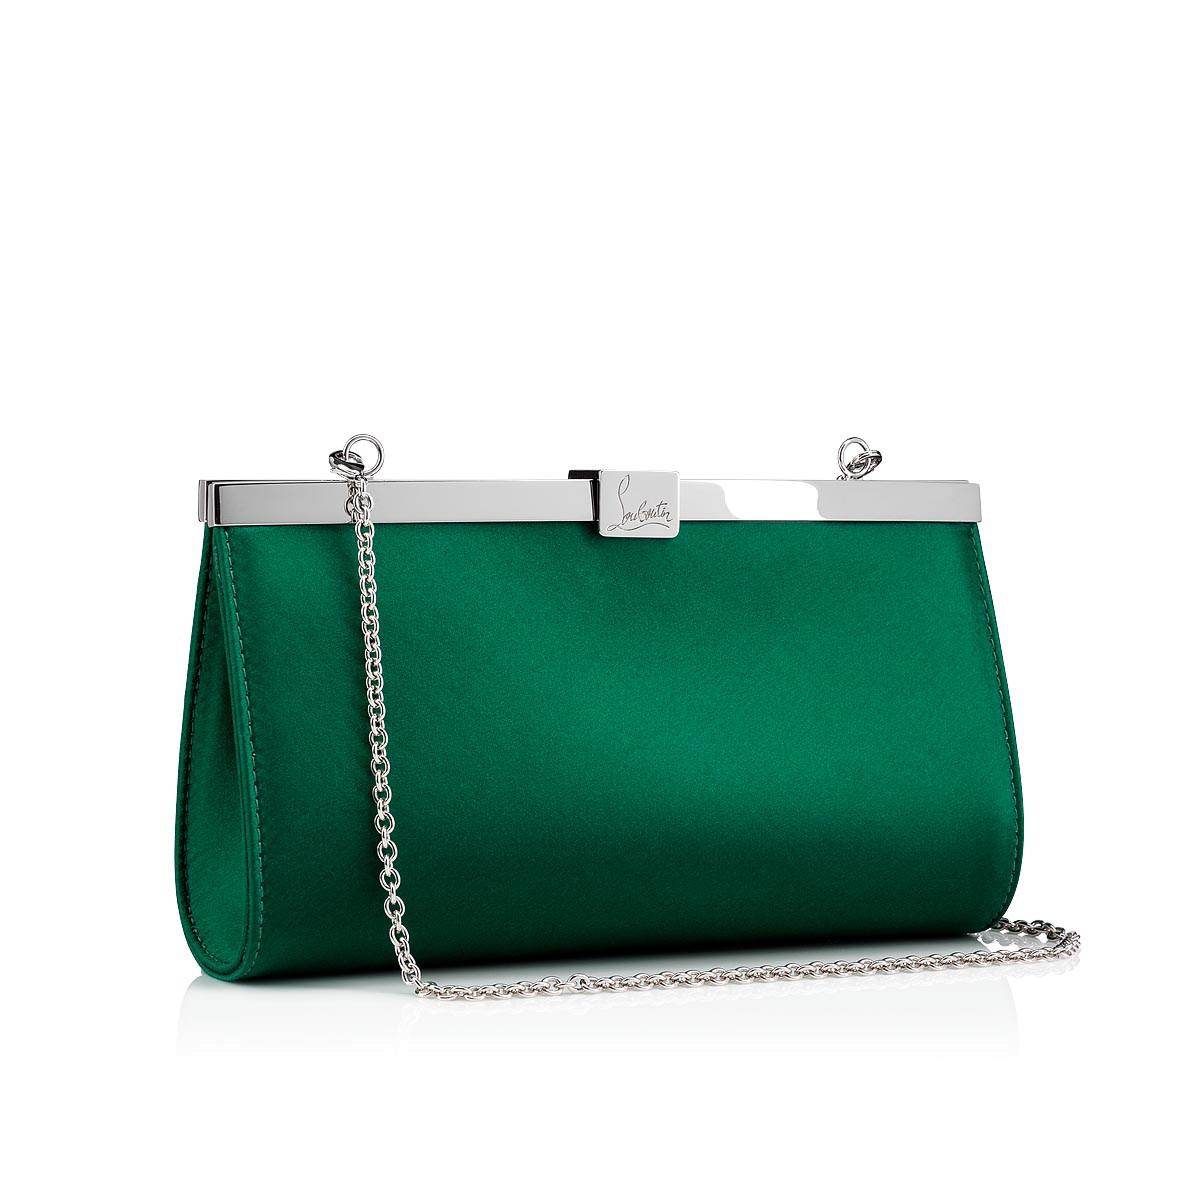 Women Bags - Palmette Small Clutch - Christian Louboutin